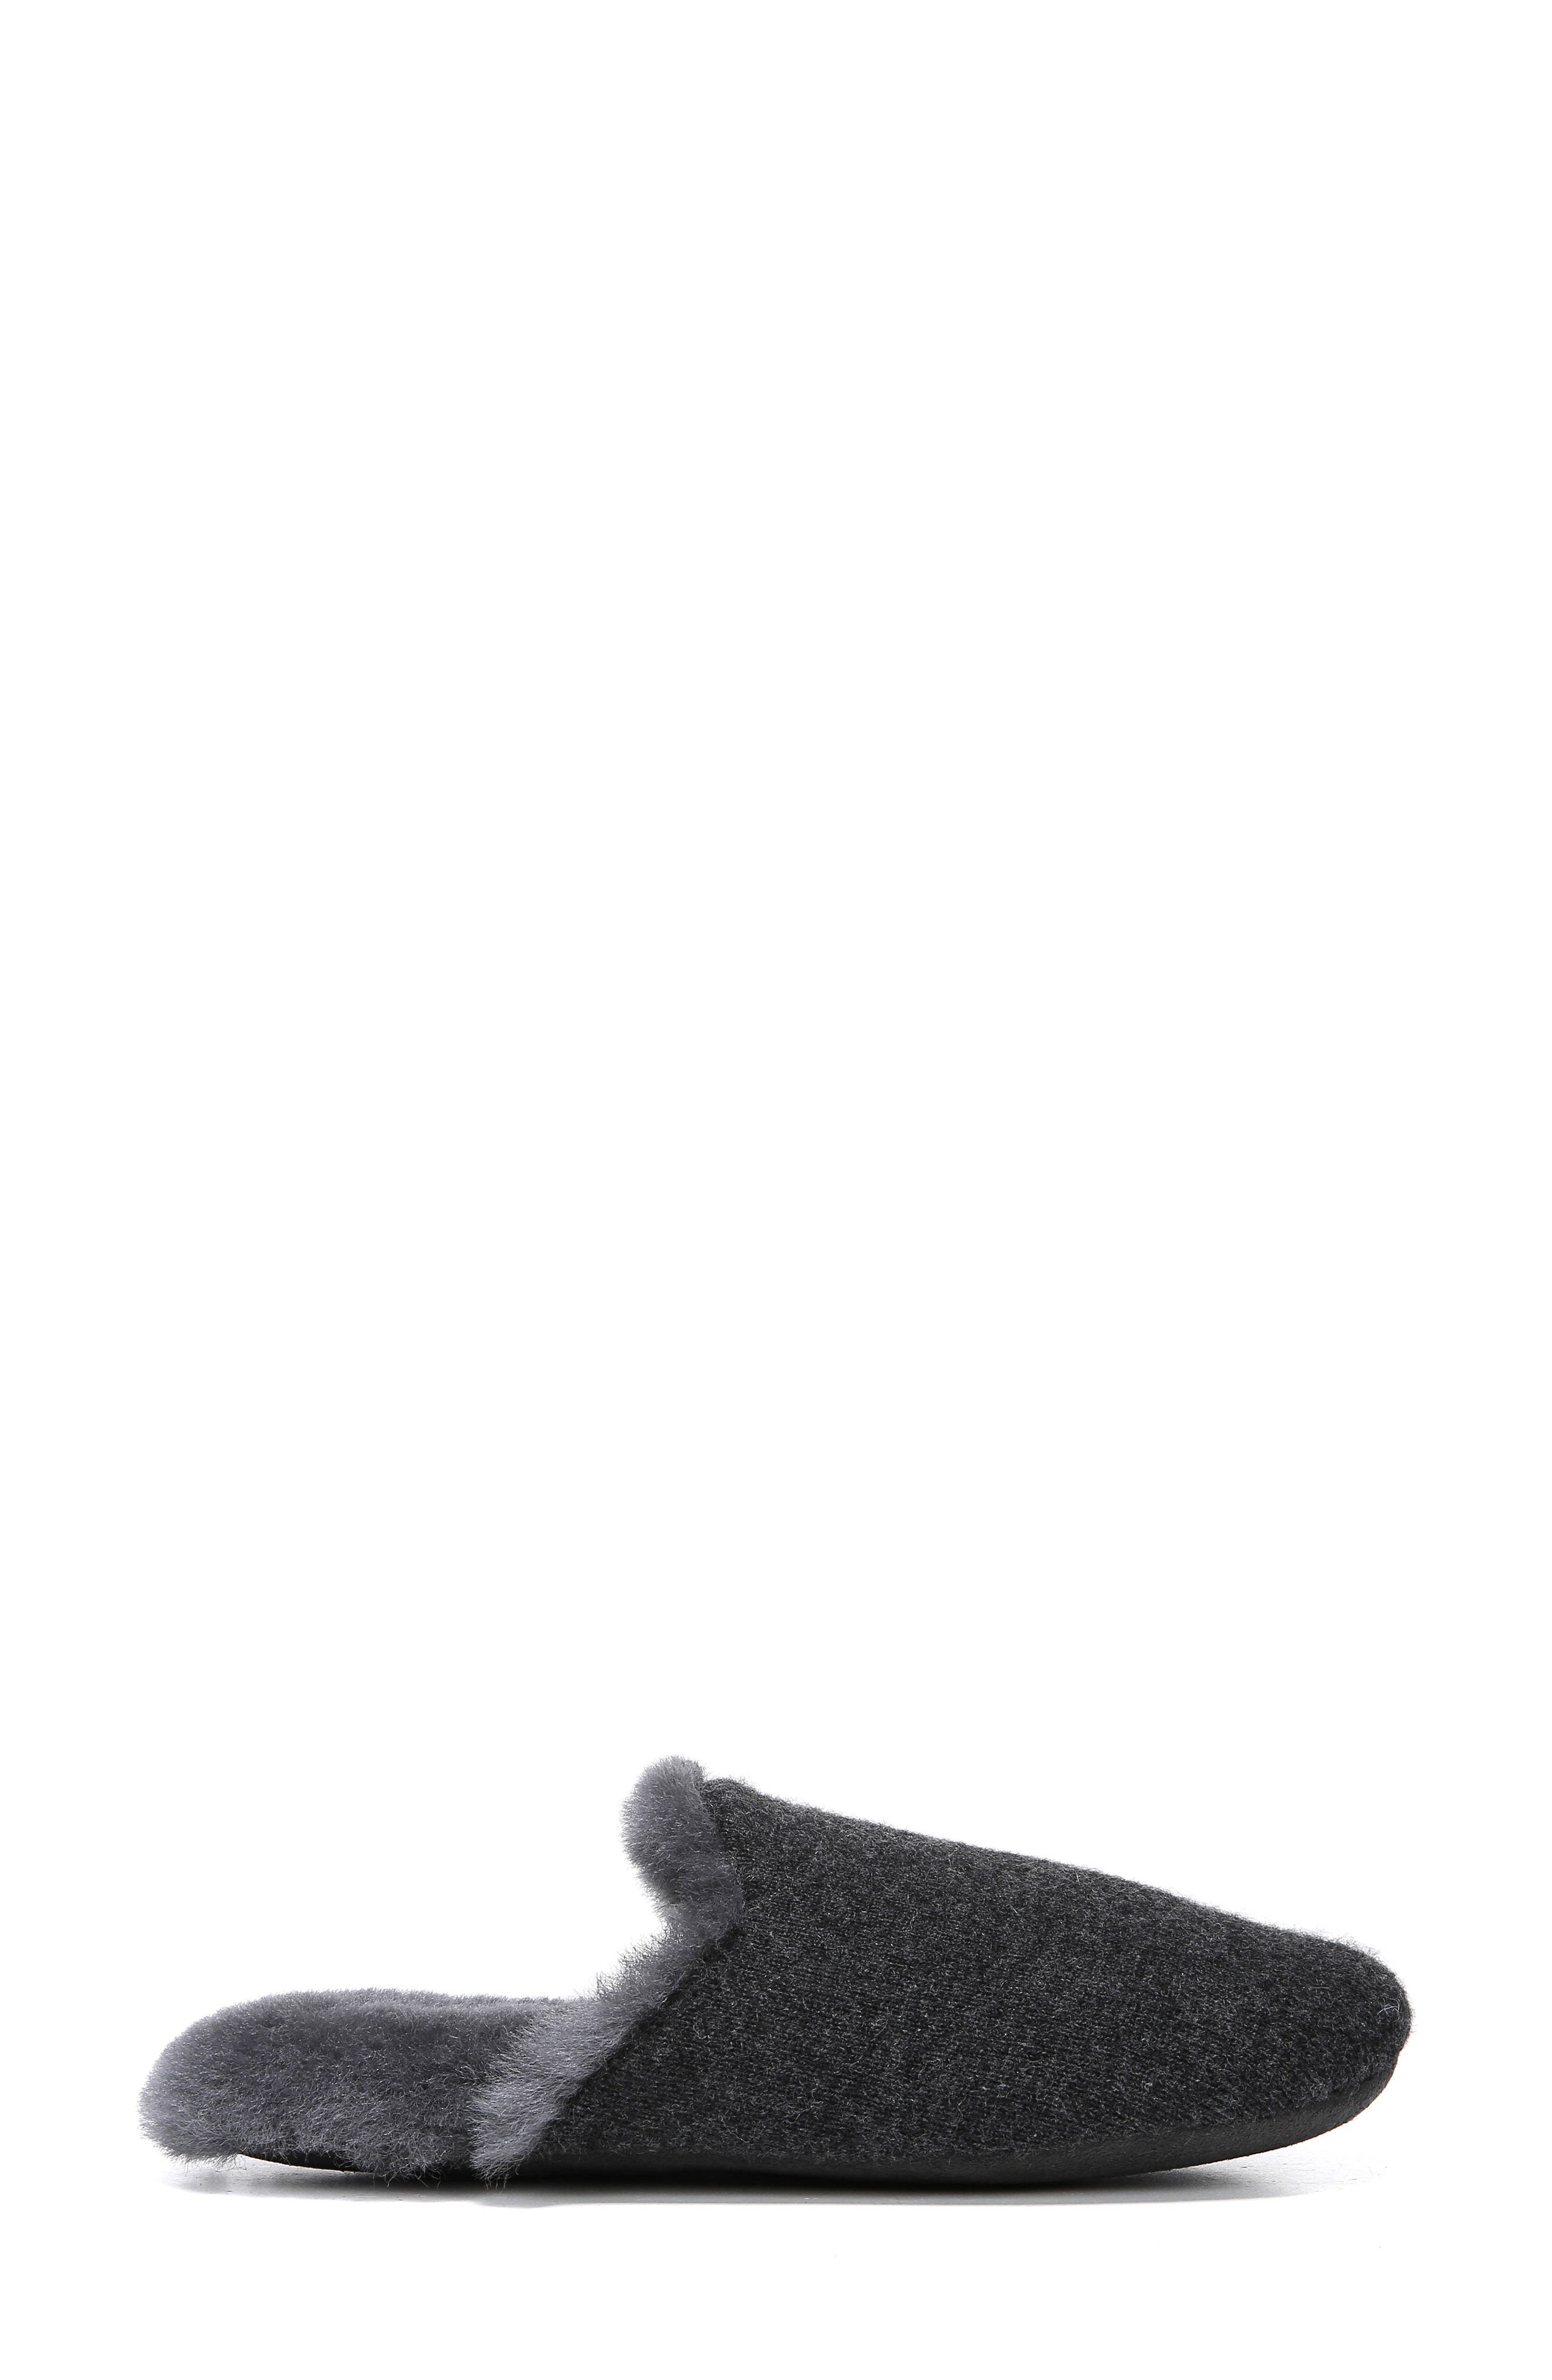 Cadie Genuine Shearling Slipper,                             Alternate thumbnail 3, color,                             CHARCOAL